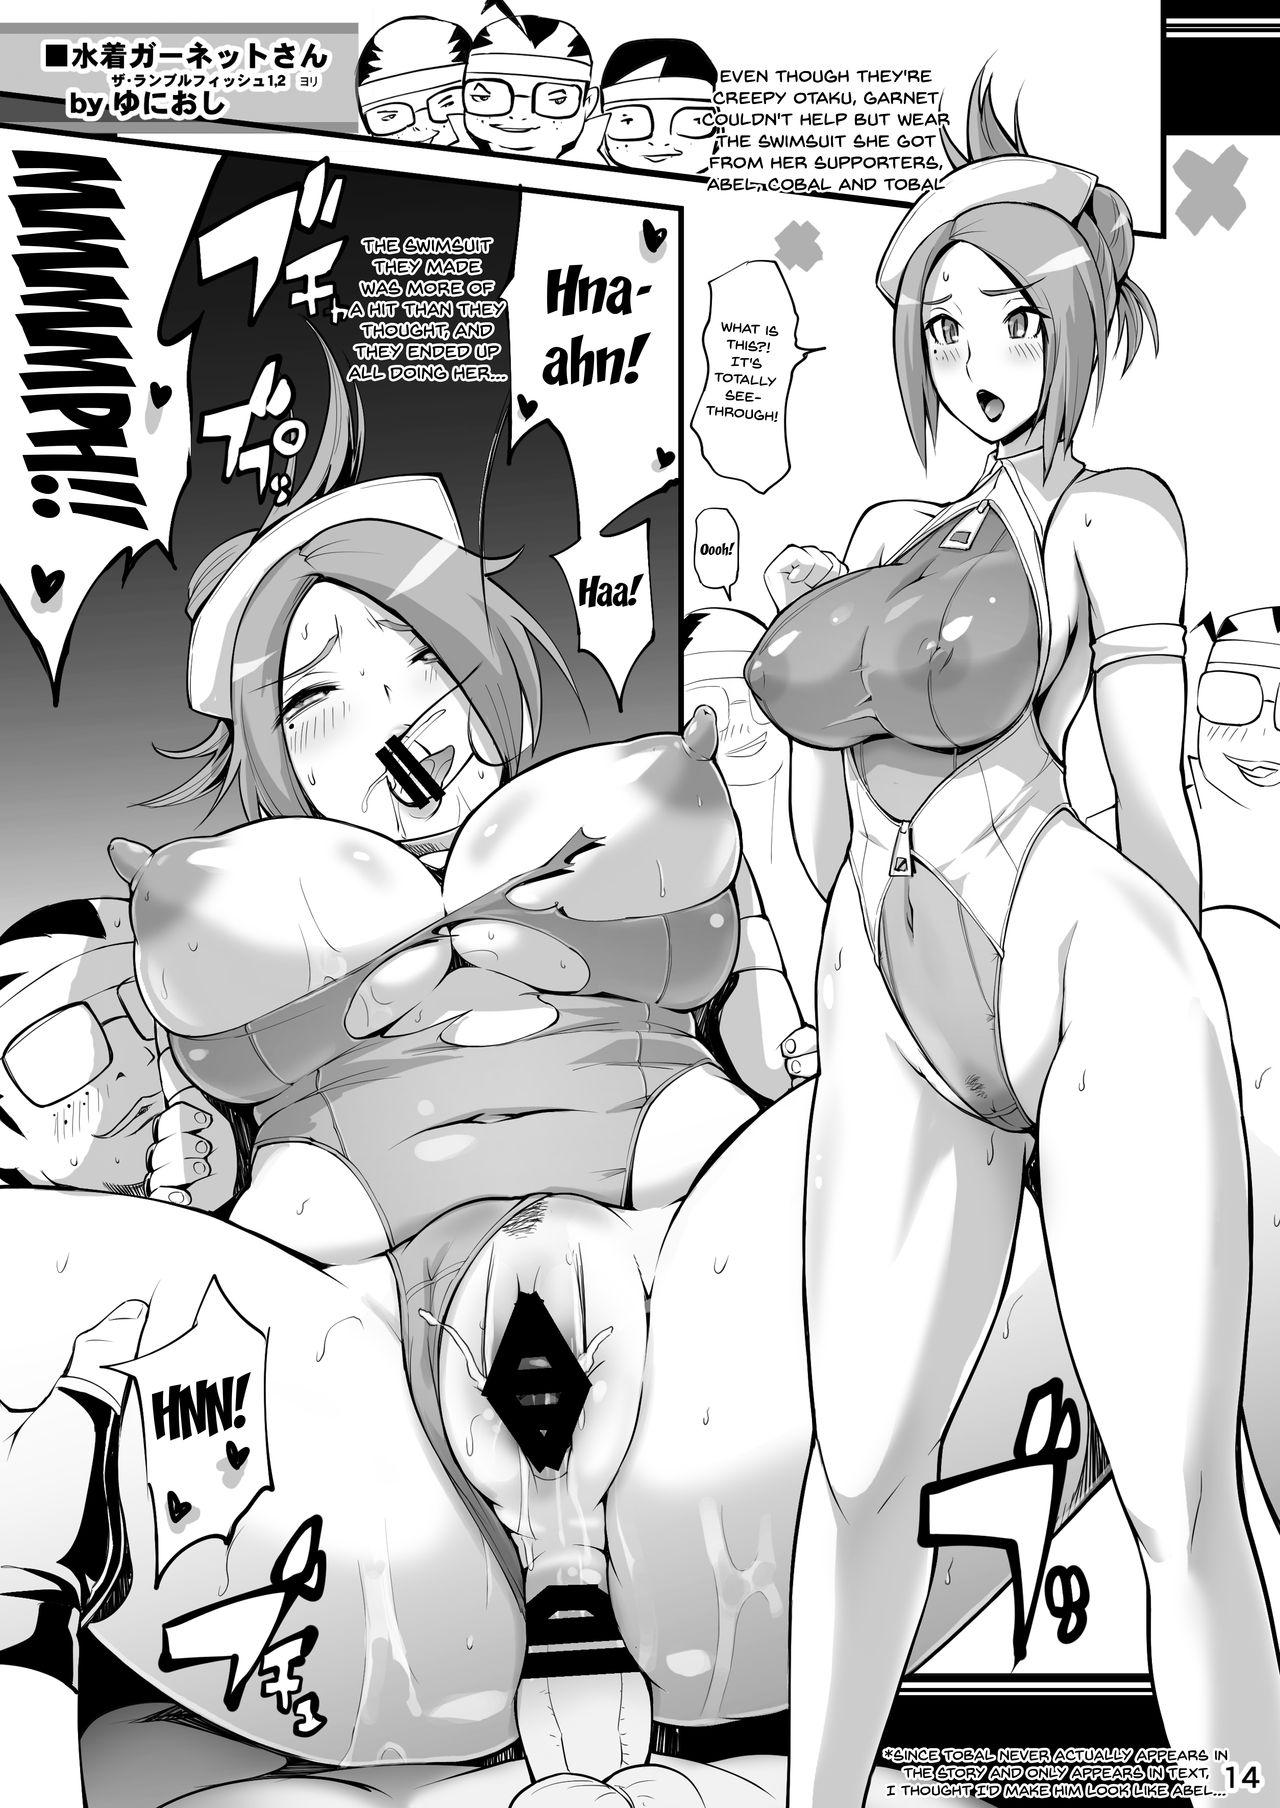 [POWERPLAY (Various)] CAPCOM (& MORE!) VS FIGHTING GIRLS Swimsuit & Gangbang Special (Various) [English] {Doujins.com} [Digital] 10